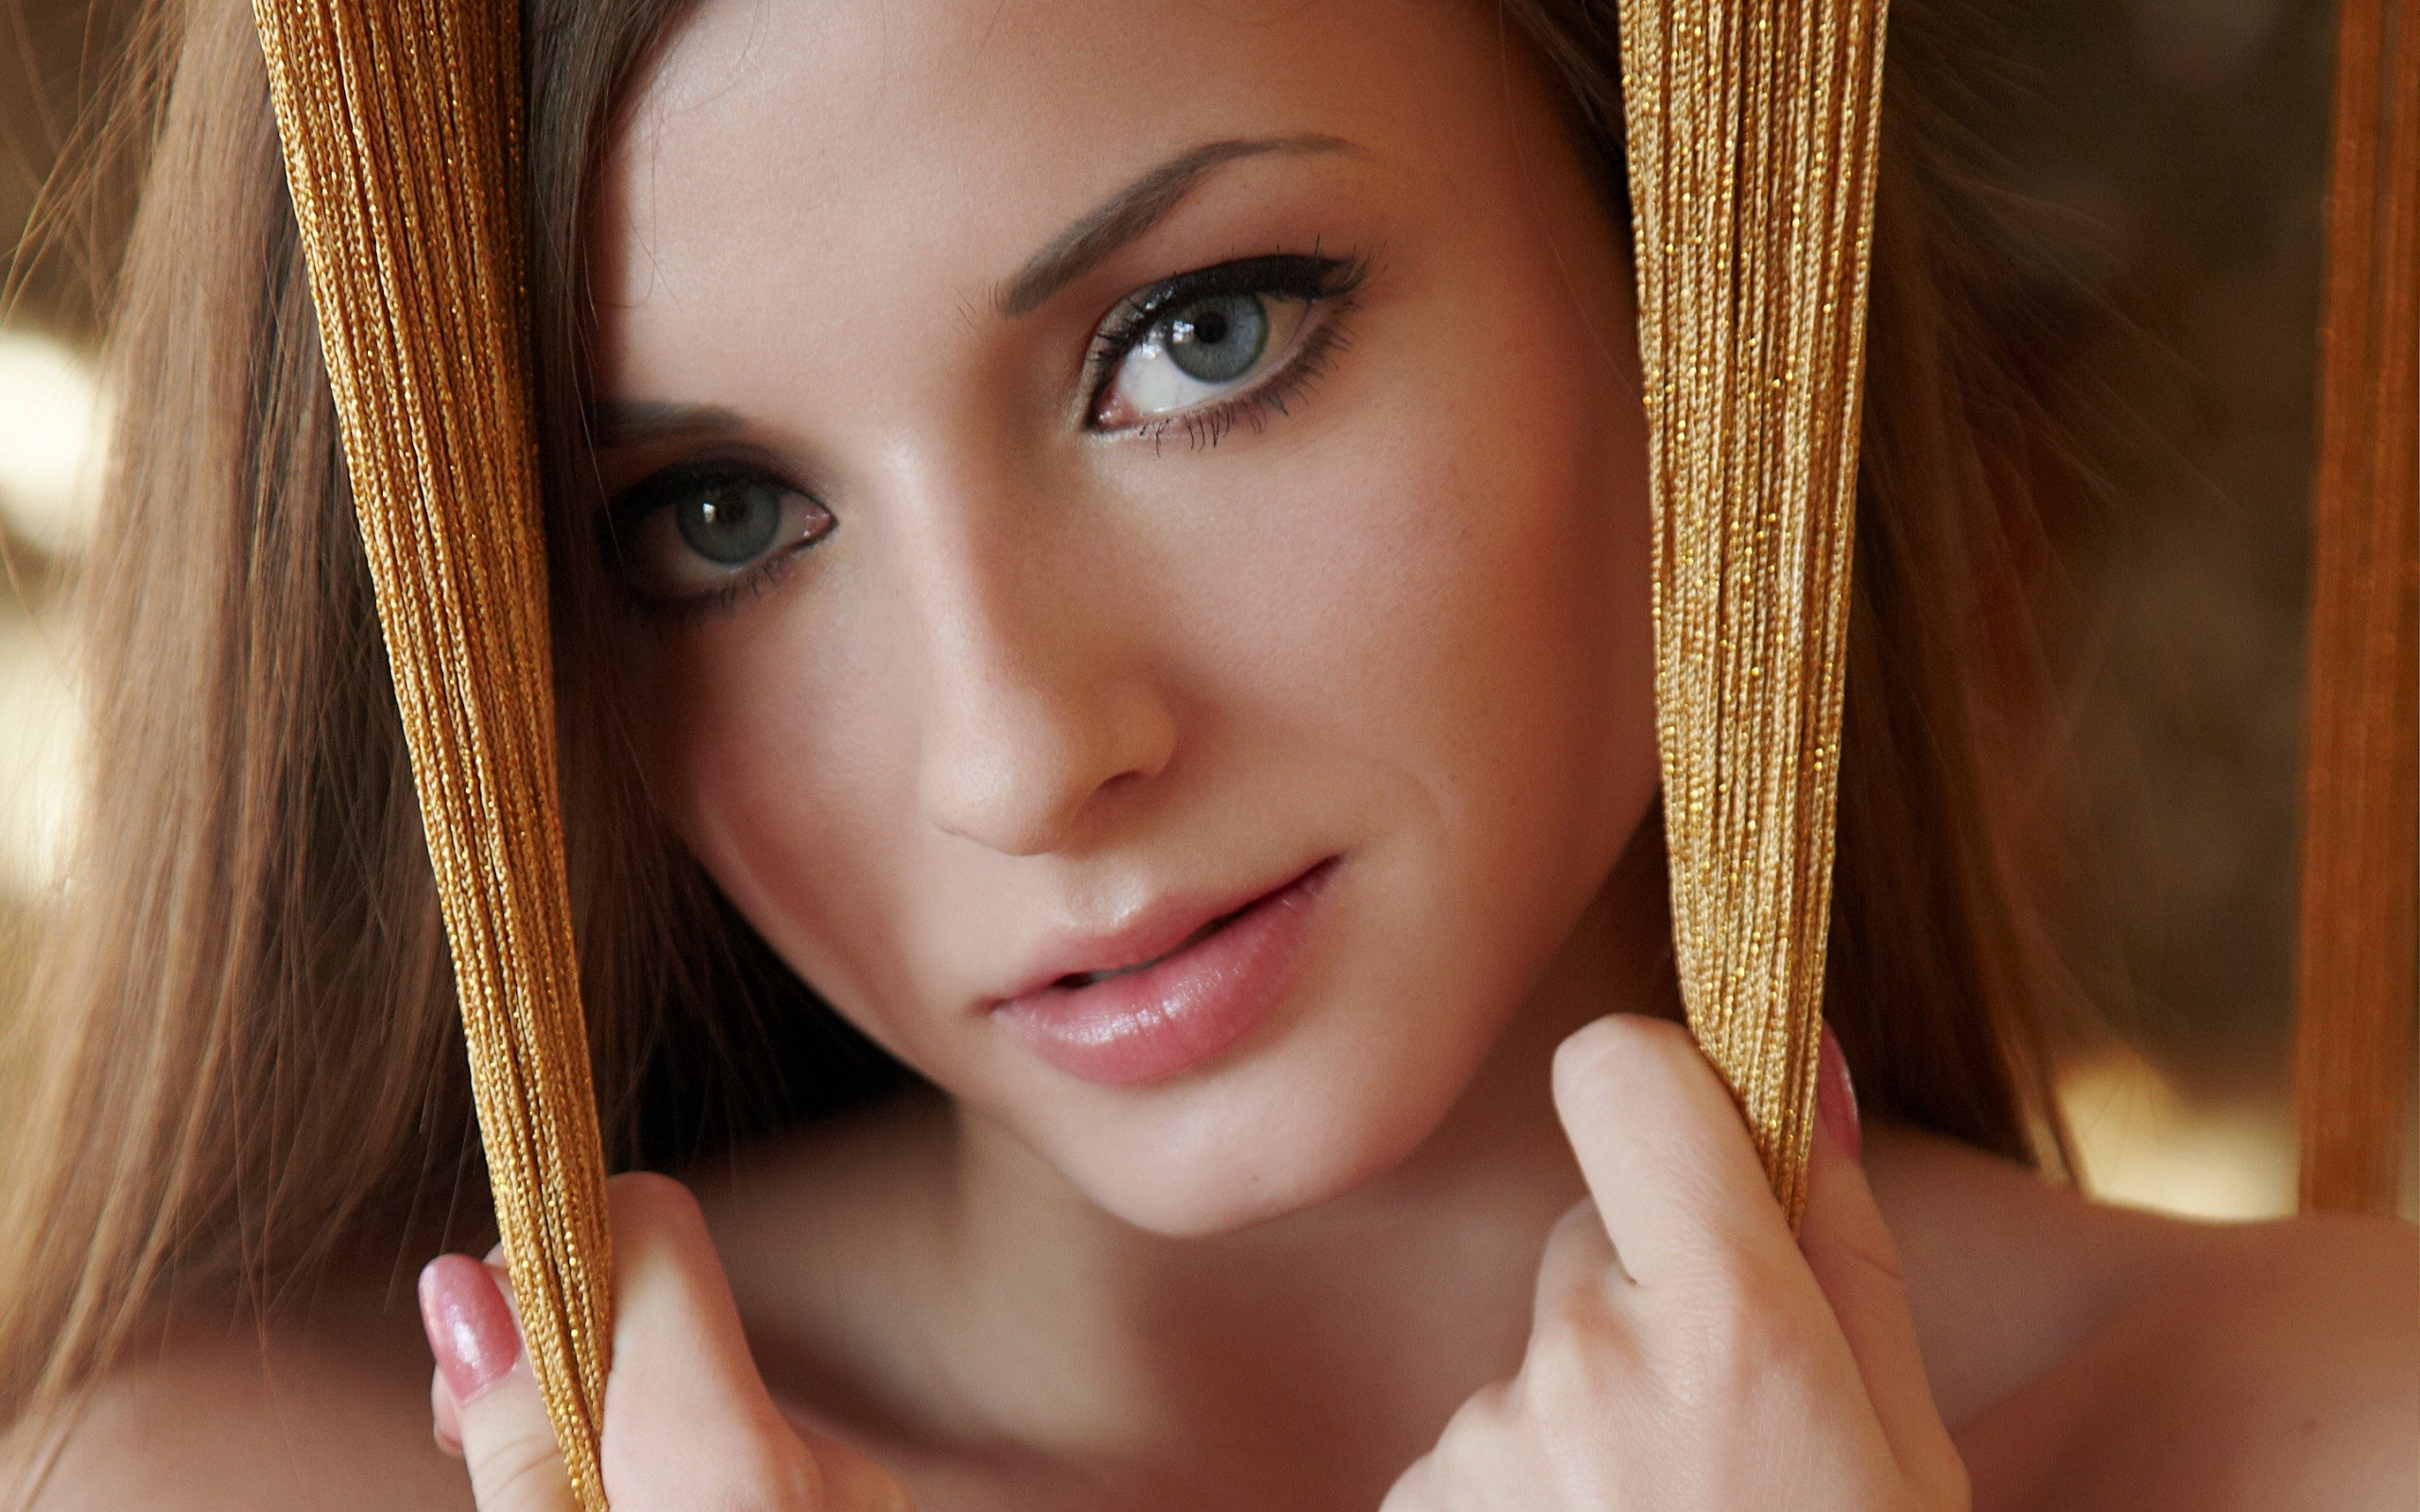 2560x1600 Wallpaper girl, blue-eyed, face, close-up